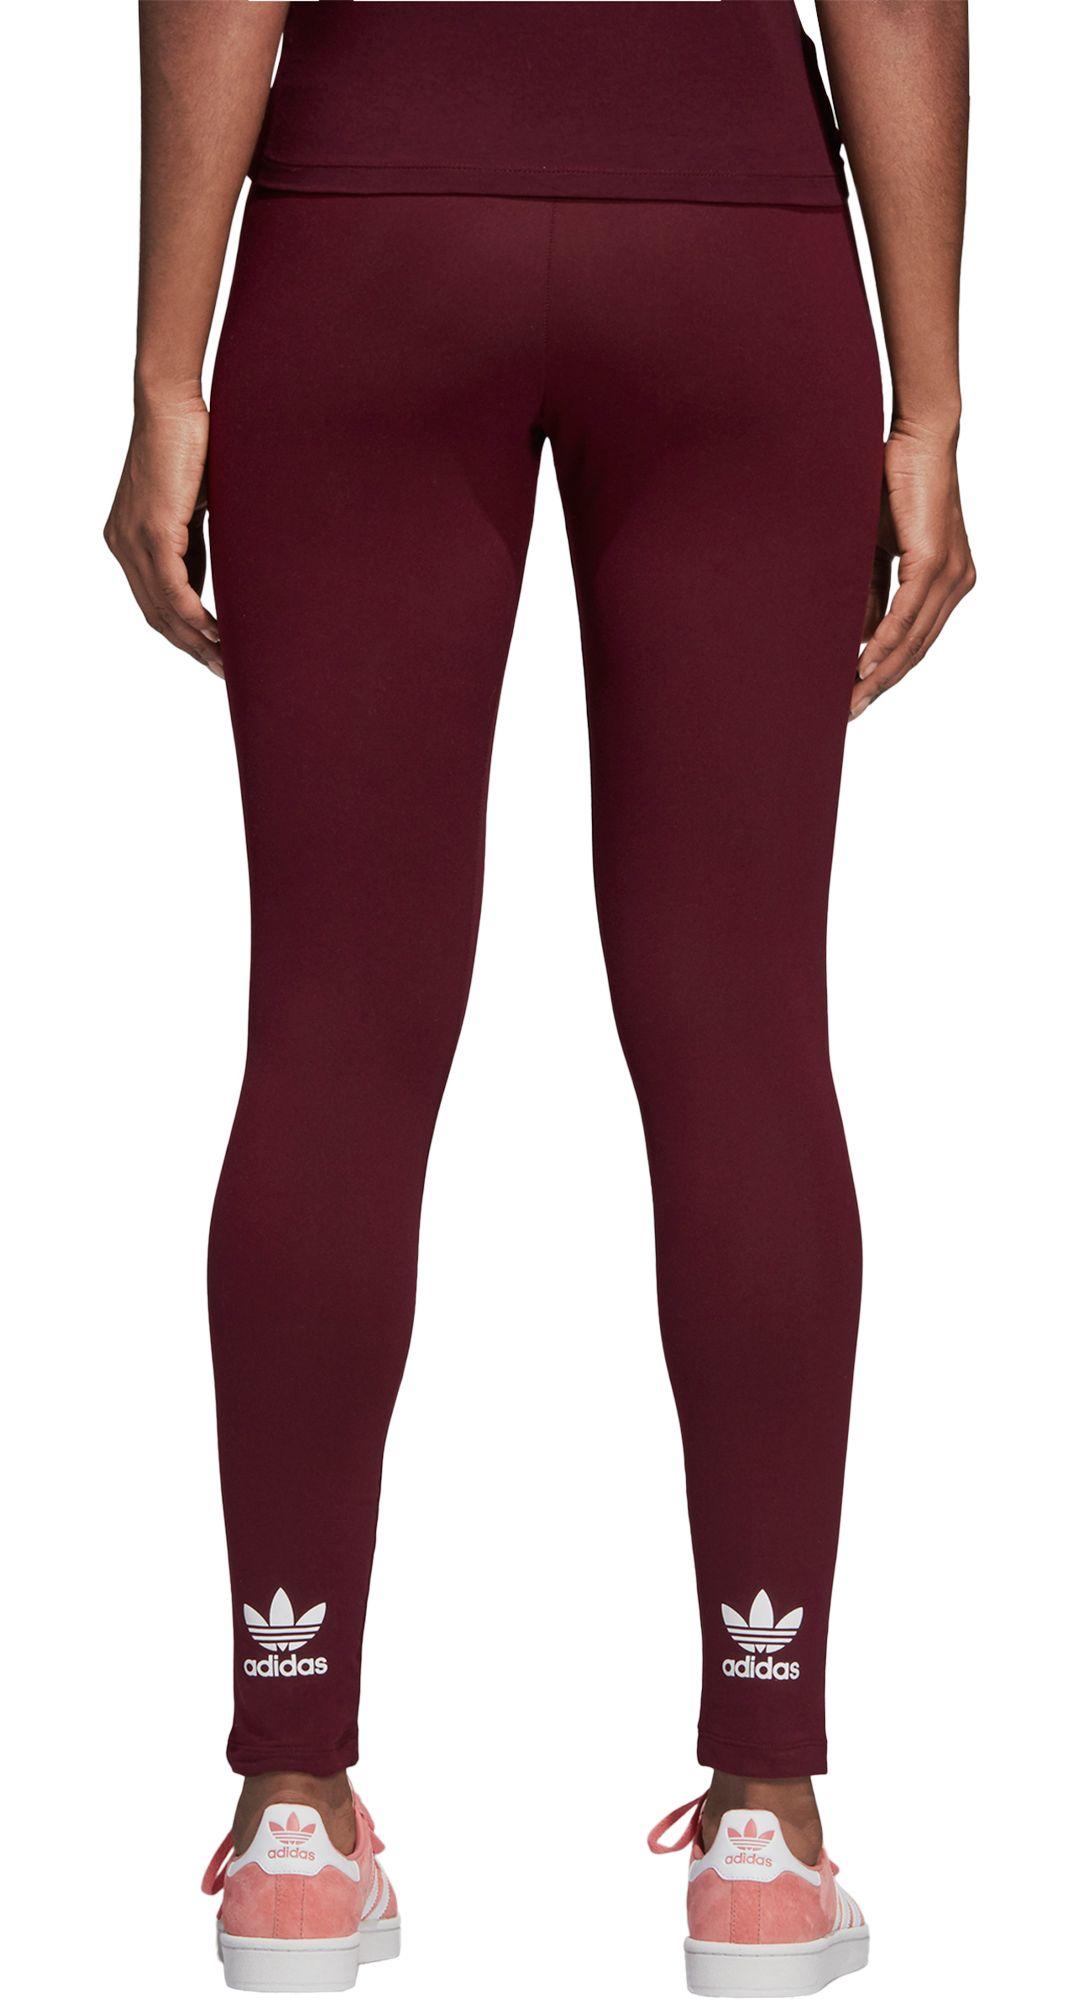 f6152b2545b adidas Originals Women's Trefoil Leggings. noImageFound. Previous